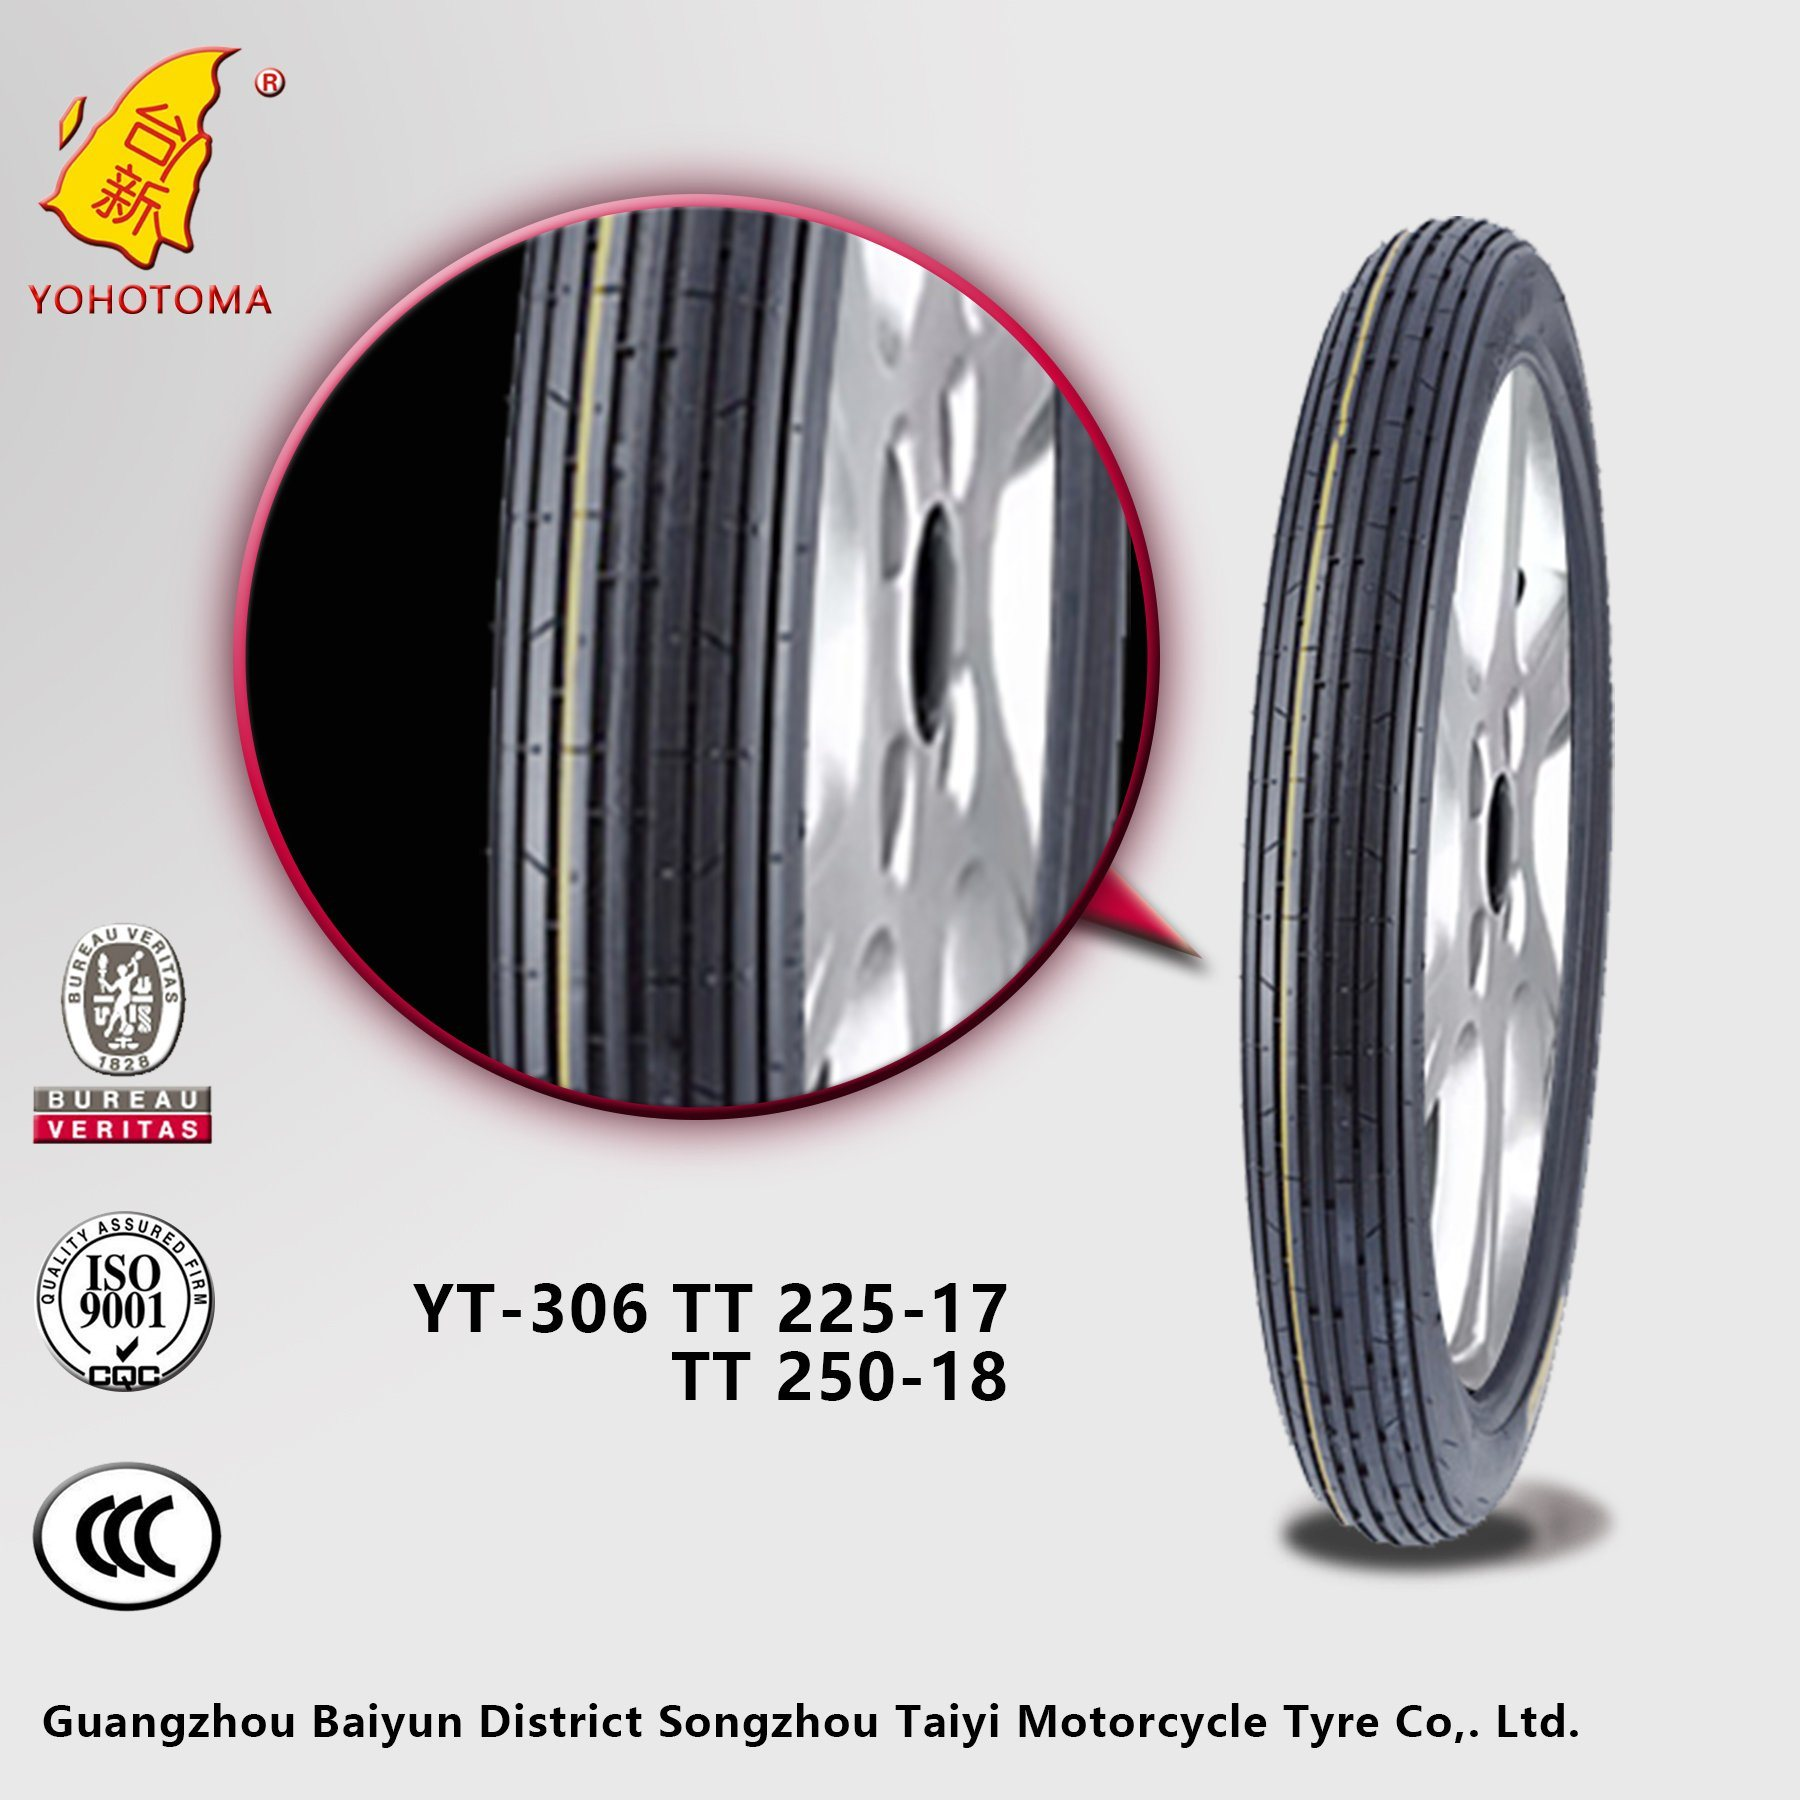 Low Price Factory Supply Moto Tyre (YT10) 225-17 YT-306 TT